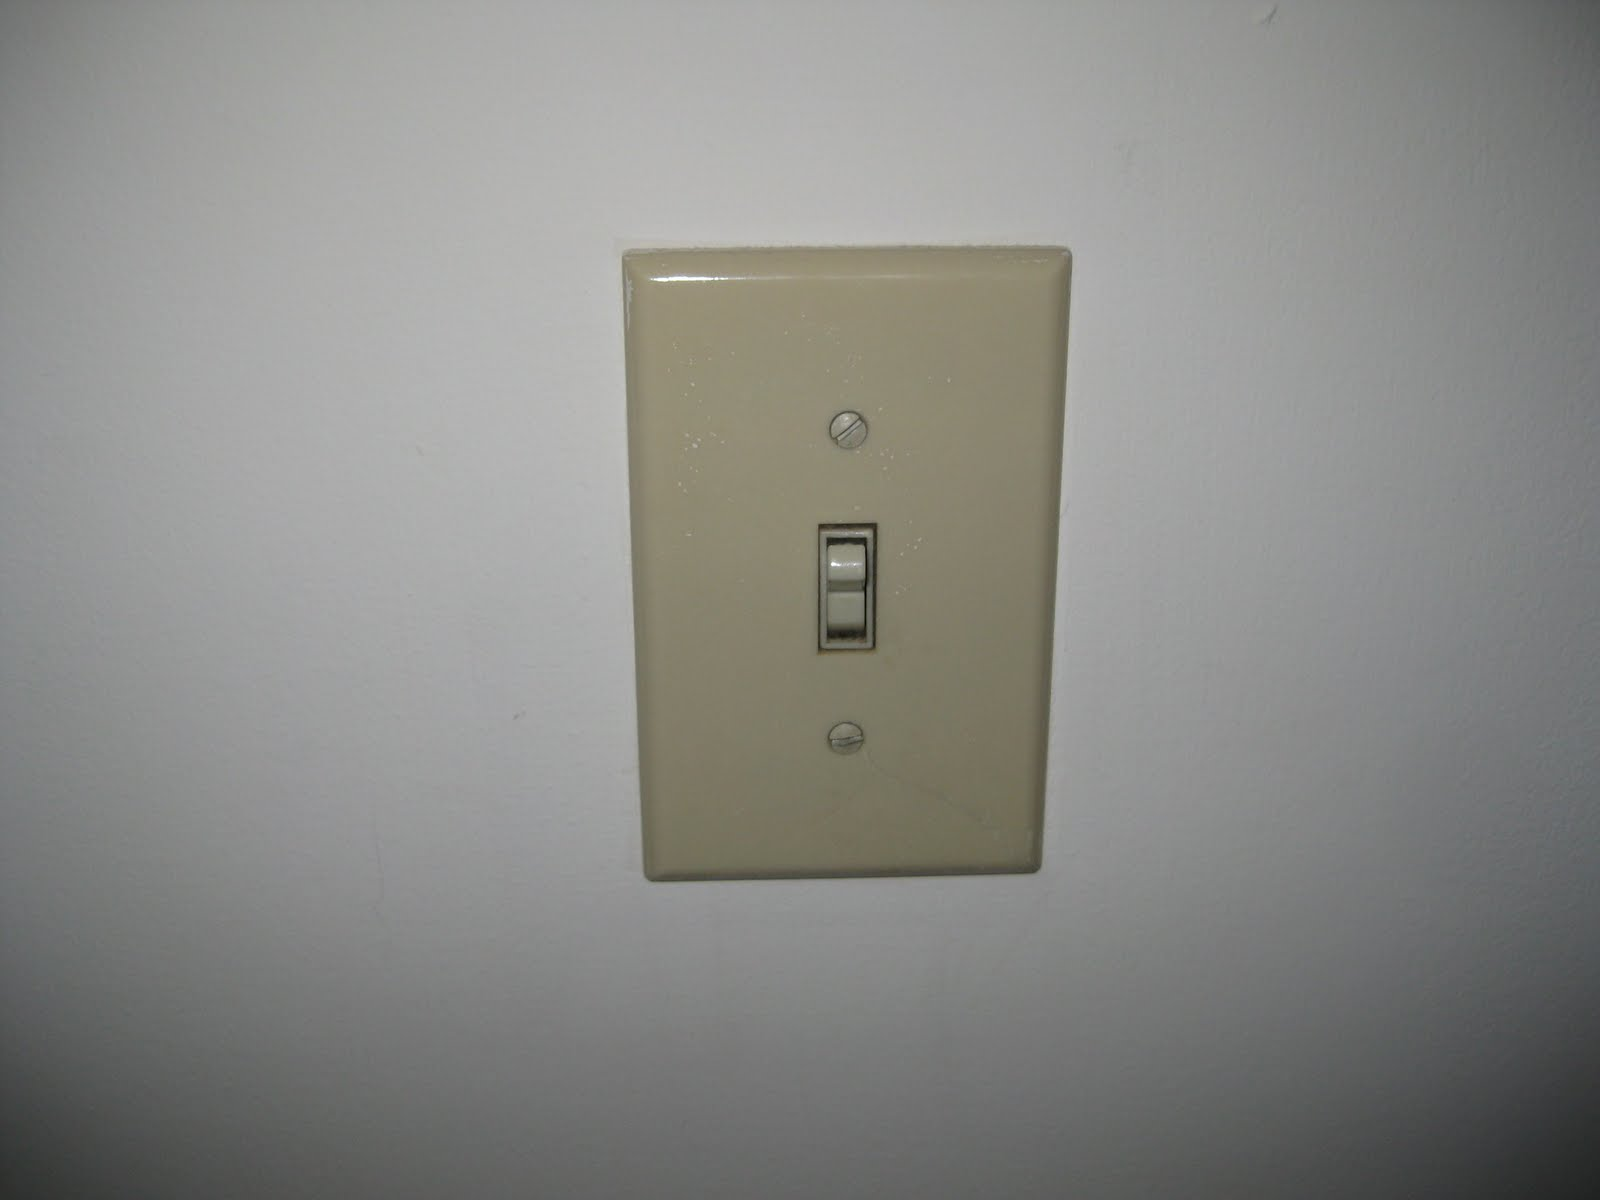 Wiring Problems: 2011